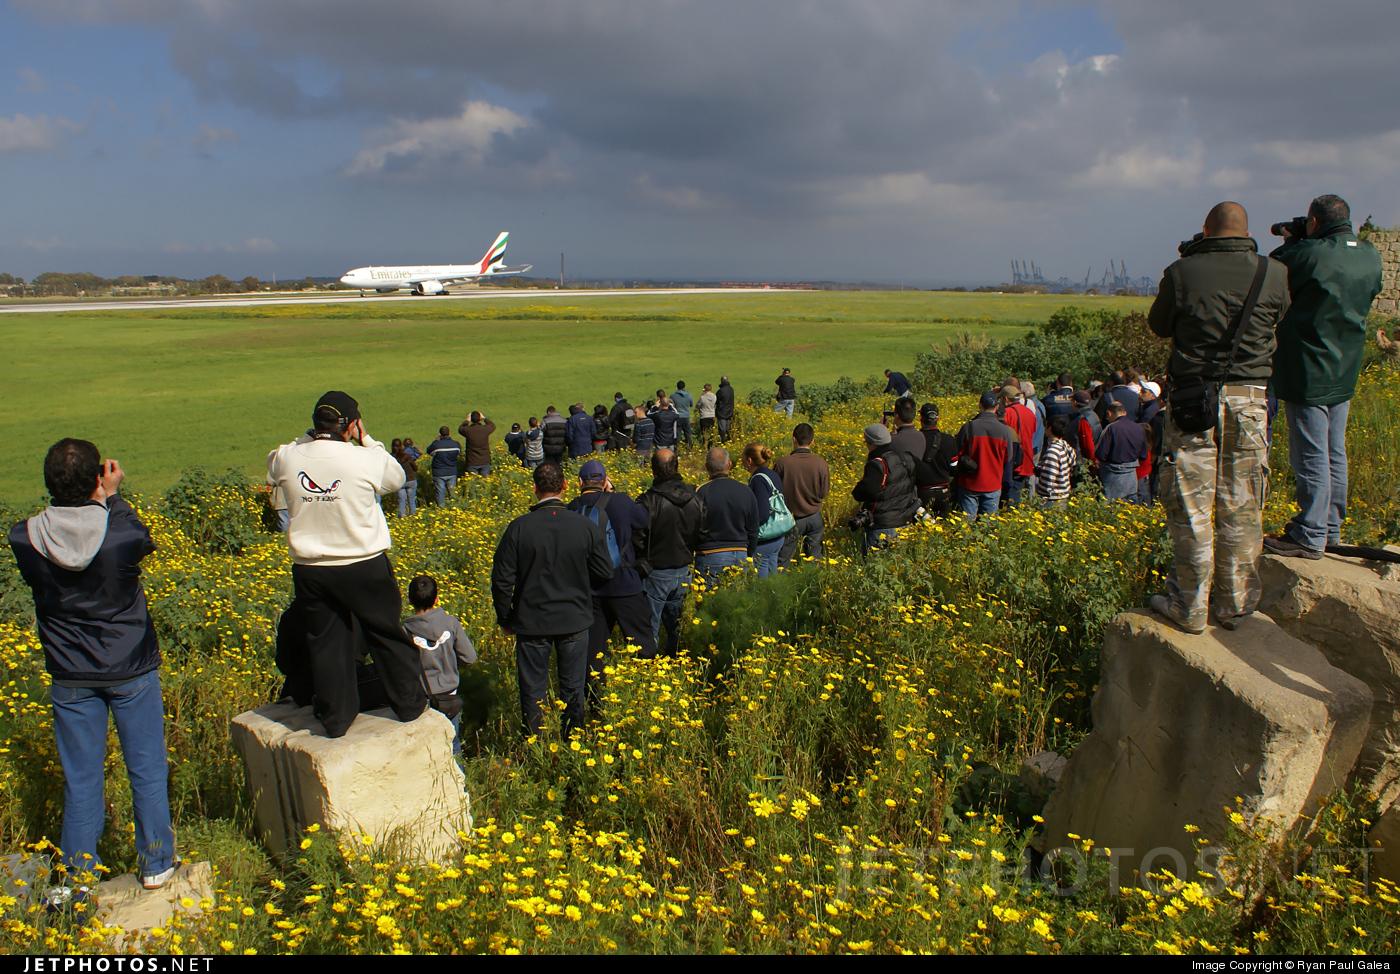 Photo of LMML Airport by Ryan Paul Galea - Aerospray